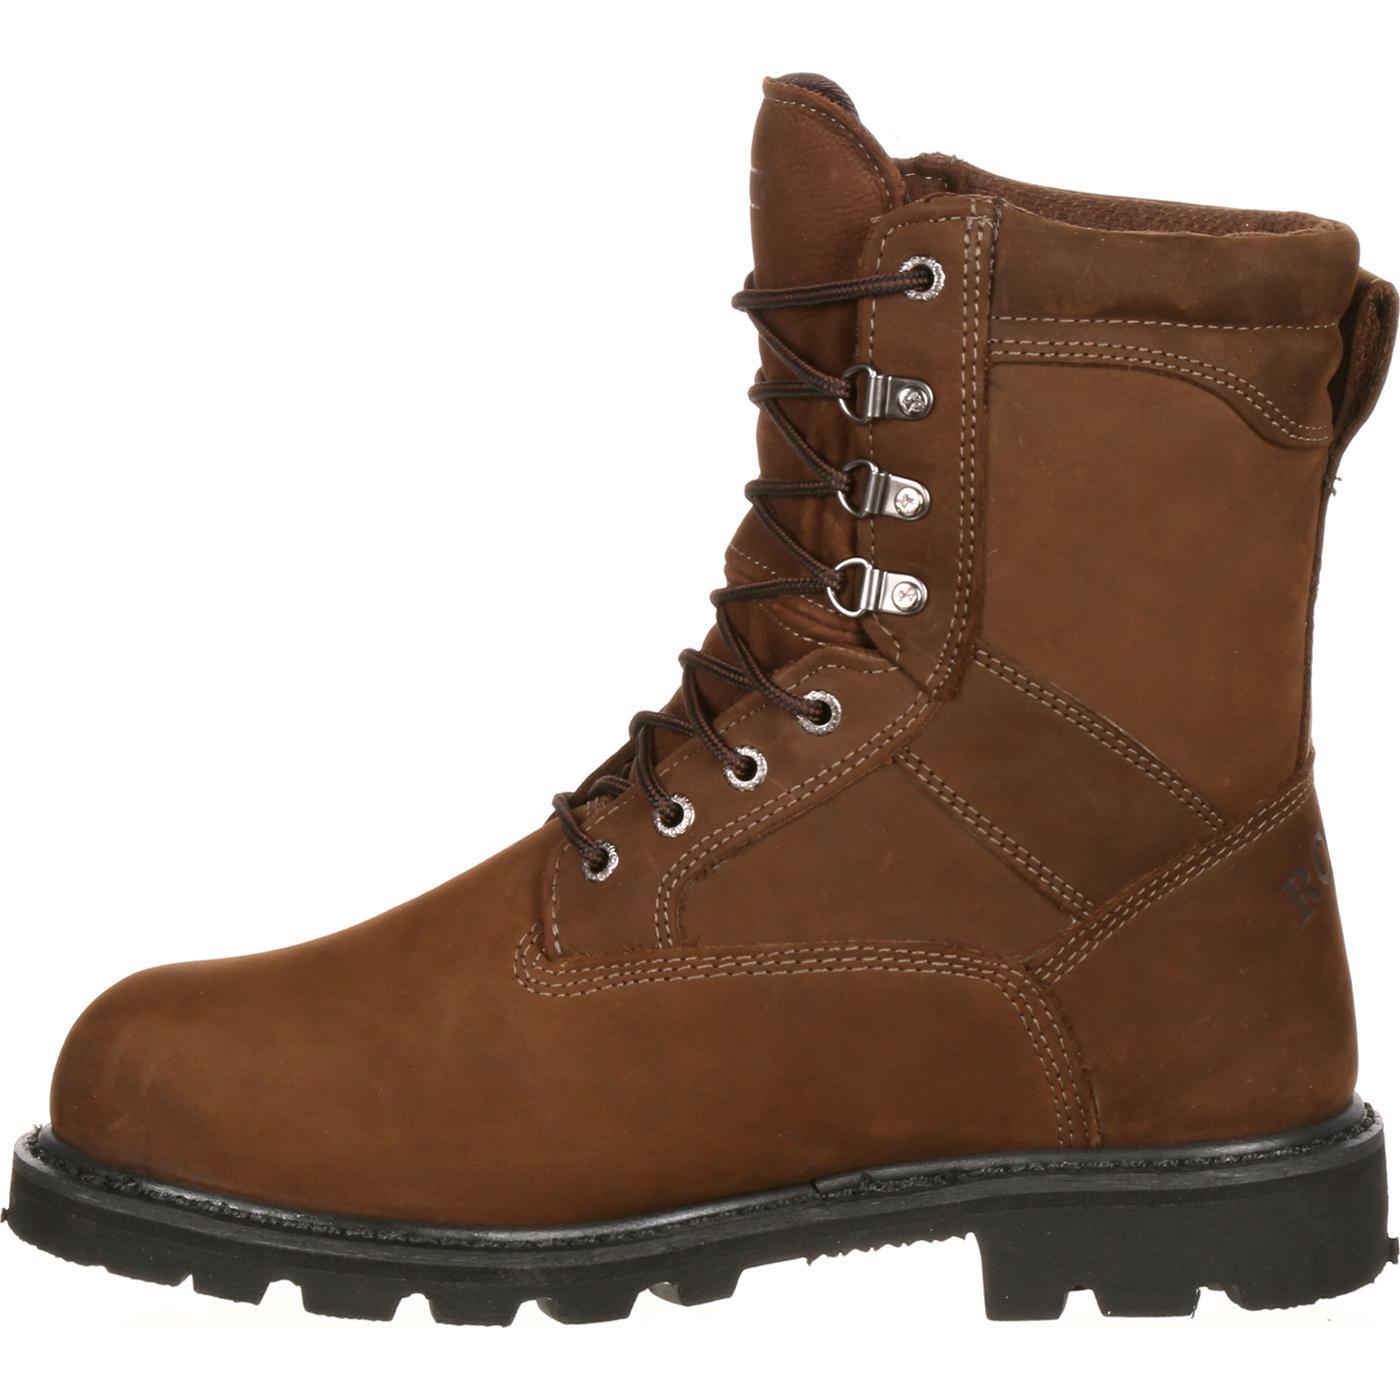 1b56f2af058 Rocky Ranger Steel Toe GORE-TEX® Waterproof 600G Insulated Outdoor Boot